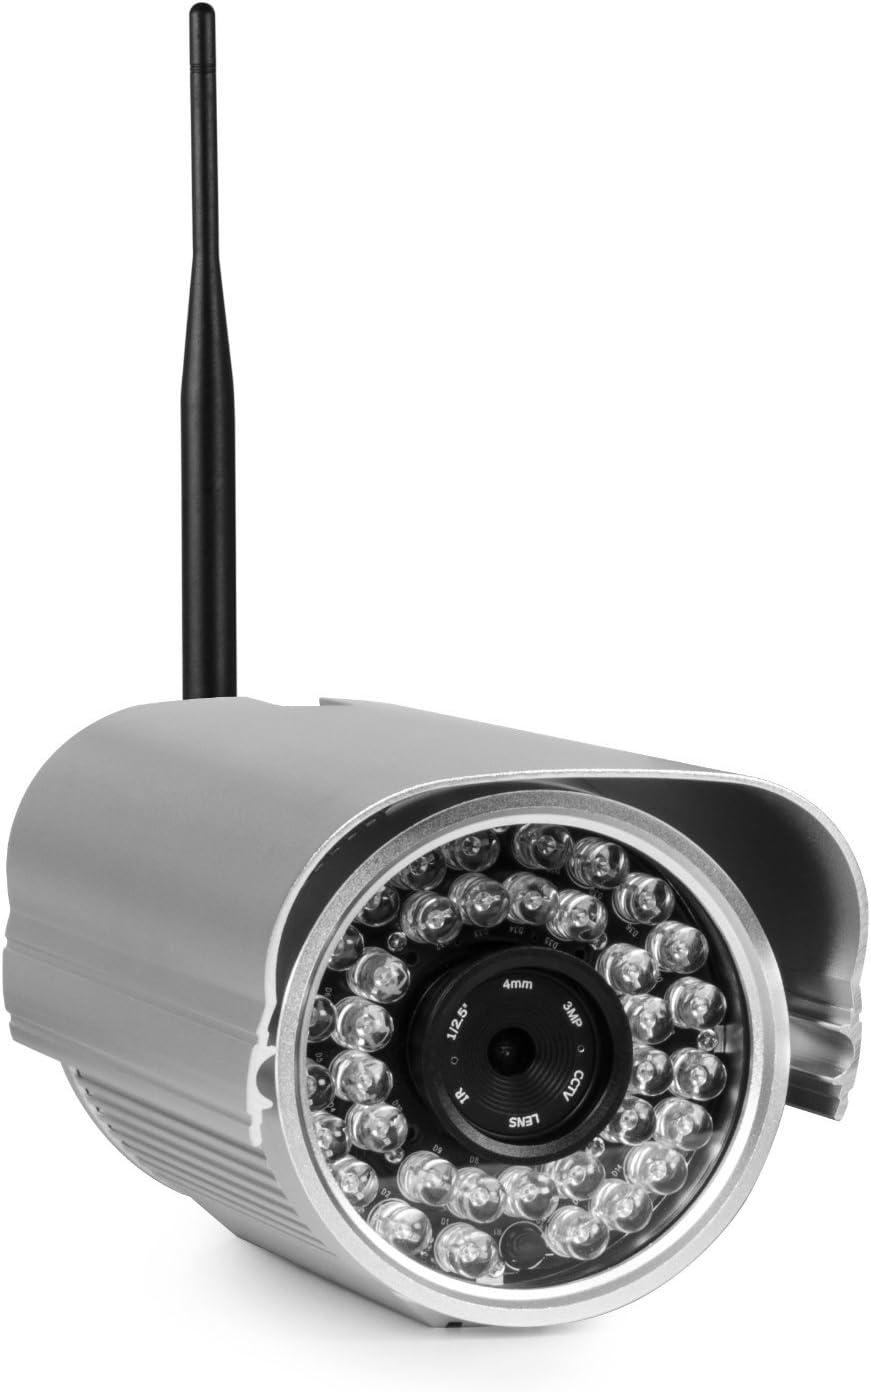 Amazon.com : Foscam FI9805P 960P Outdoor HD Wireless IP Camera (Silver) : Camera & Photo